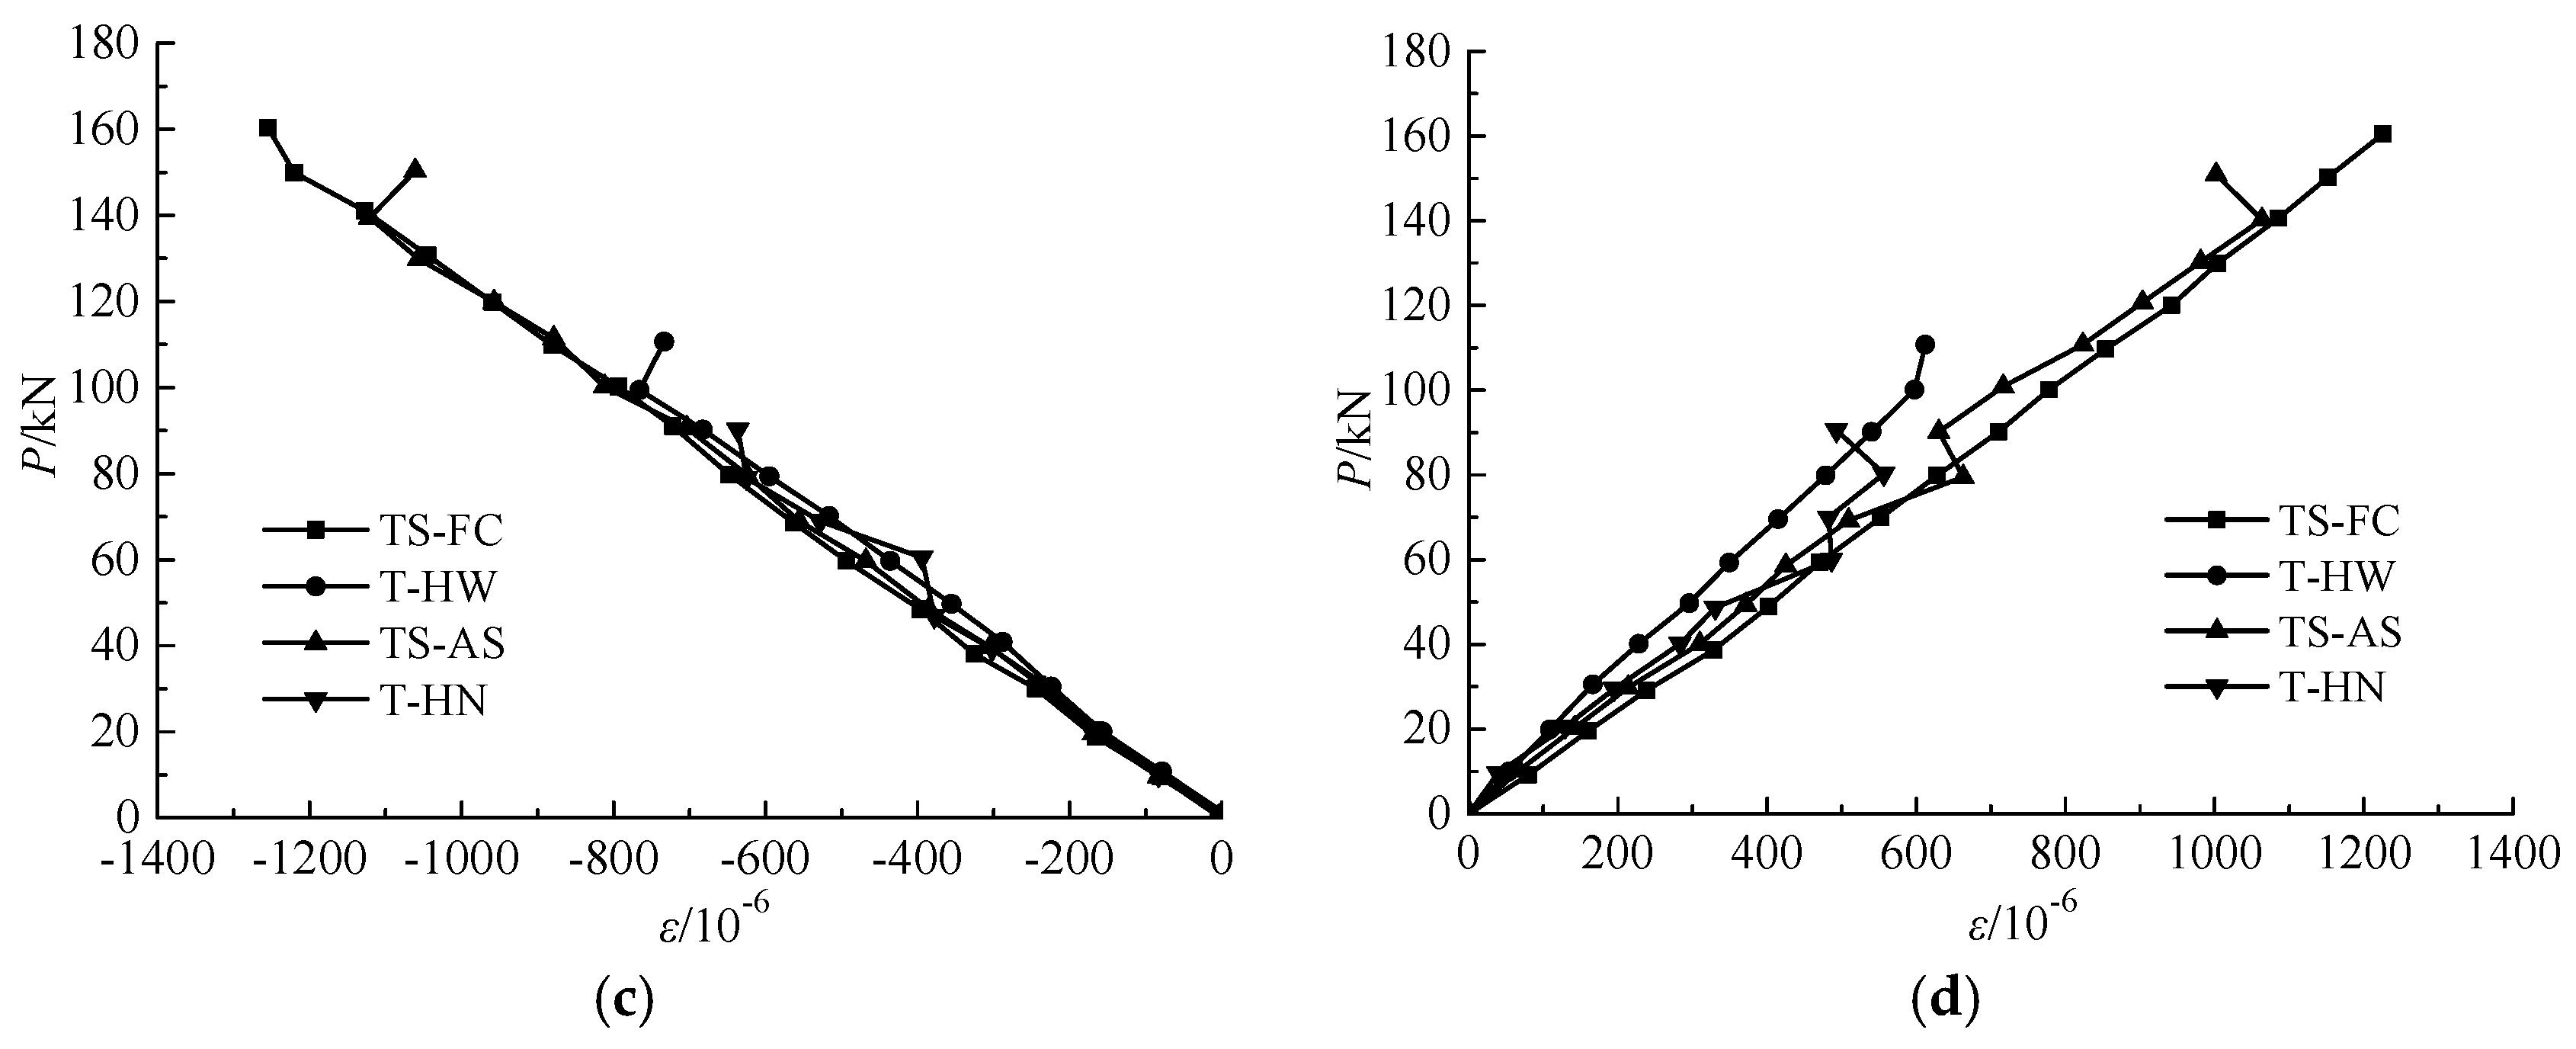 Applied Sciences Free Full Text Experimental Study On The Static Warren Truss Bridge Diagram Component Inside Applsci 08 02237 G010a G010b